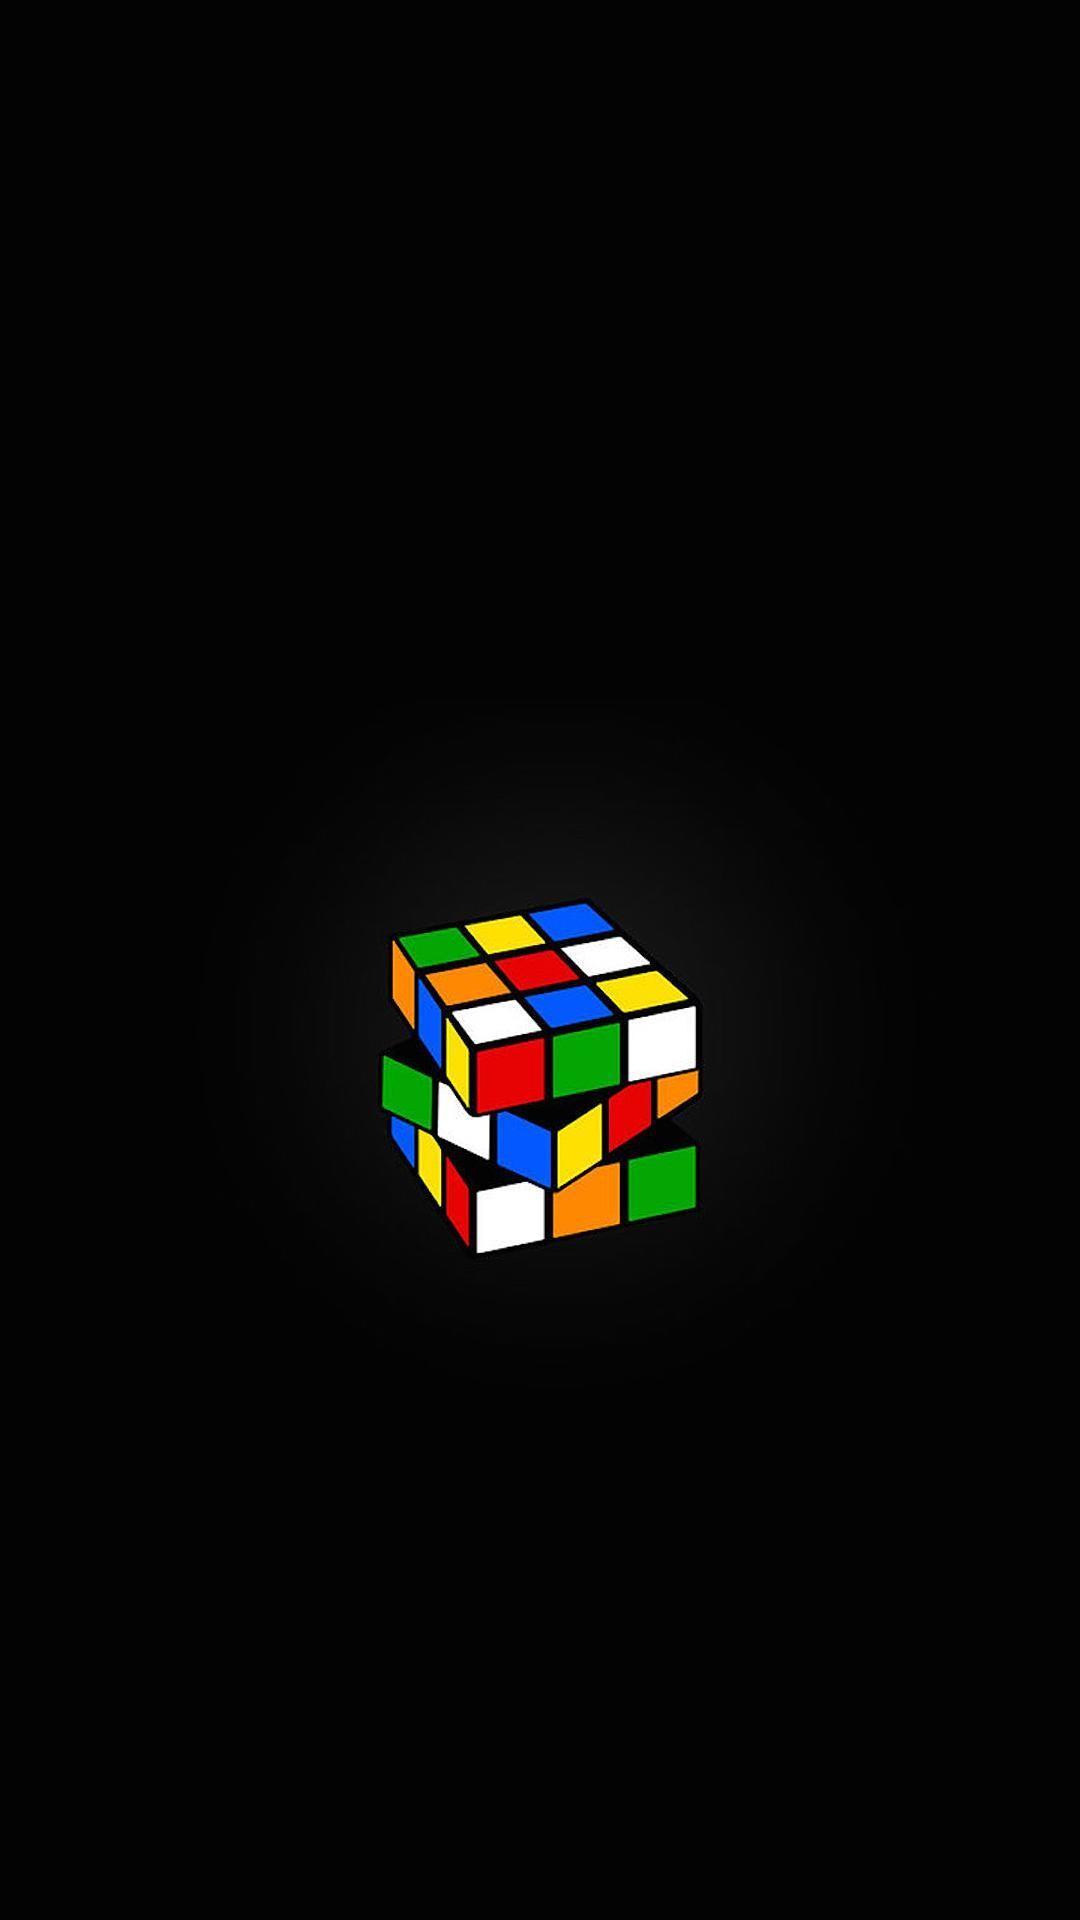 Rubiks Cube Wallpaper 76 Images Images, Photos, Reviews